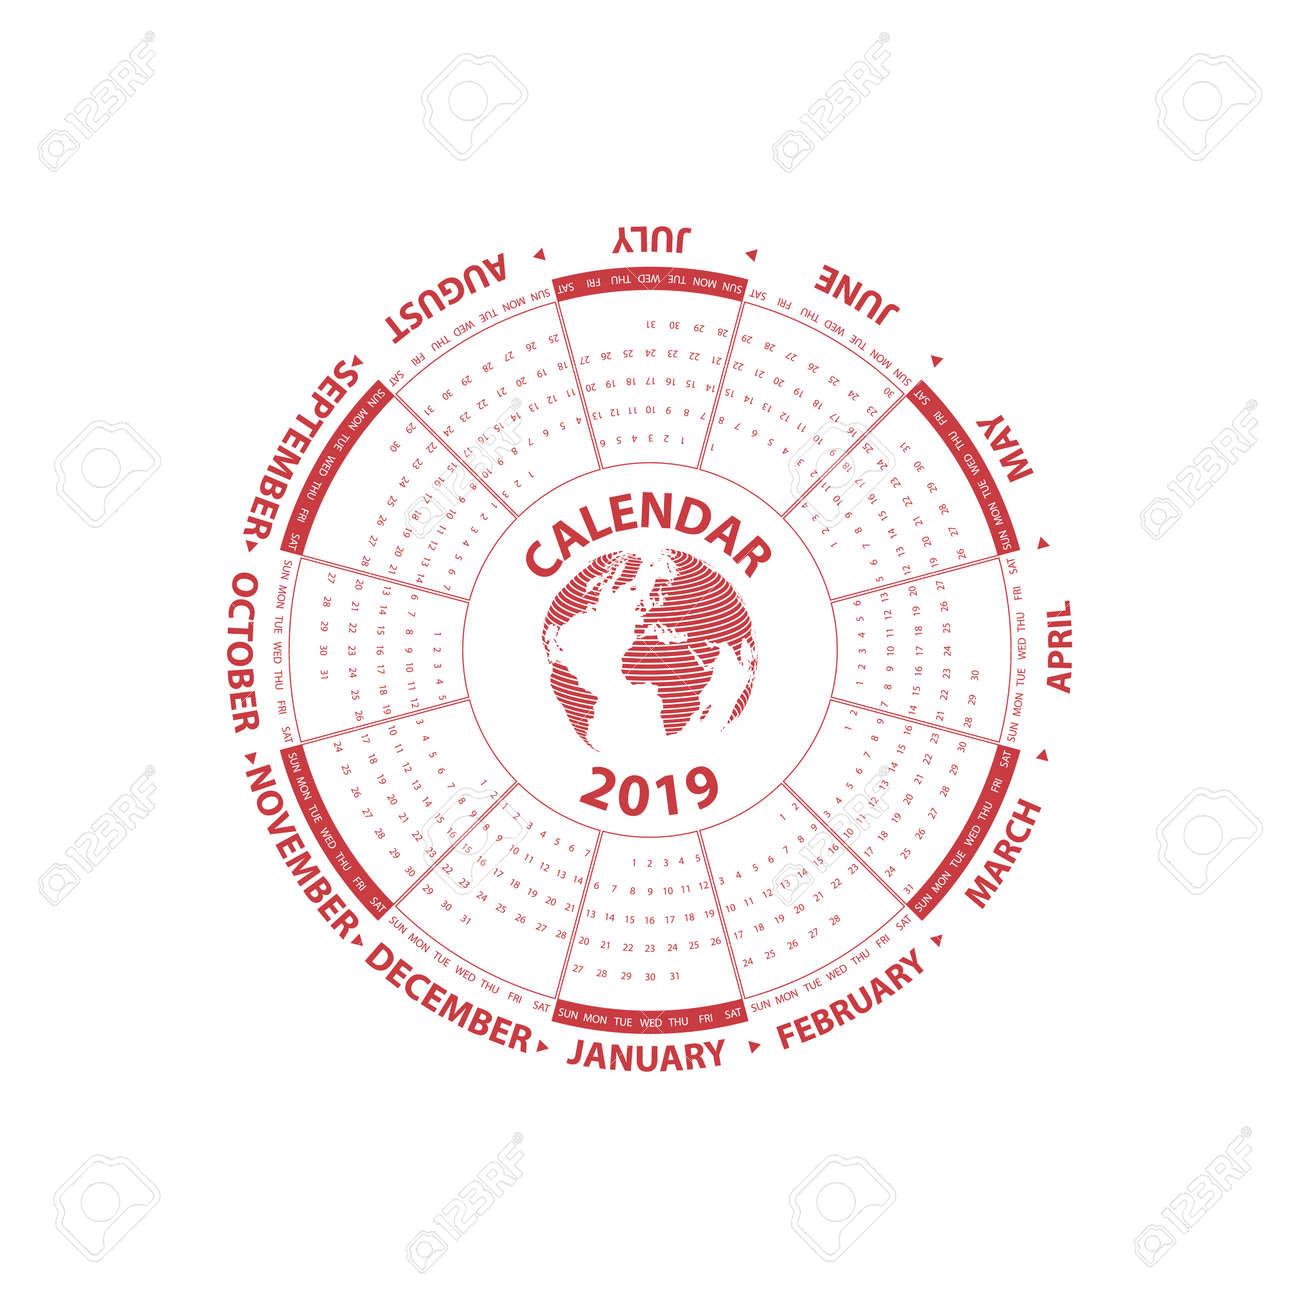 2019 Calendar Template Circle Calendar Template Calendar 2019